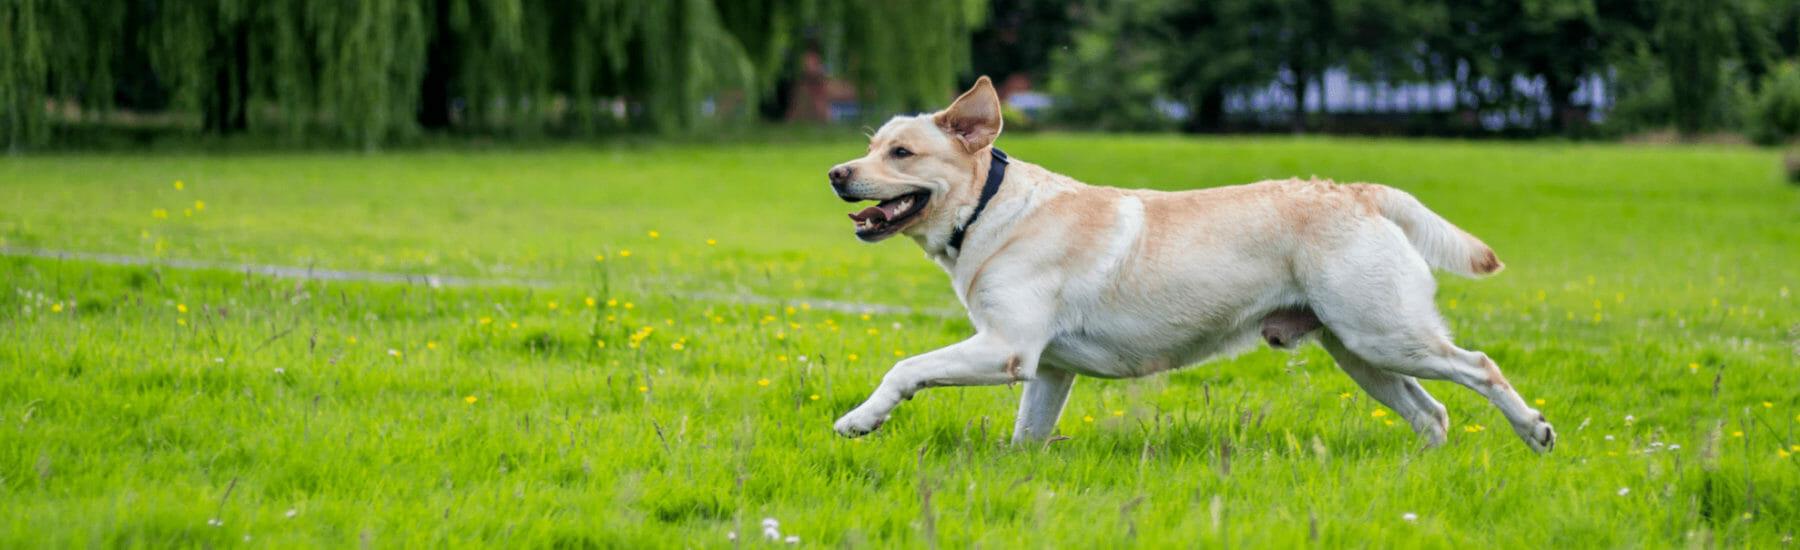 White dog running through bright green grass